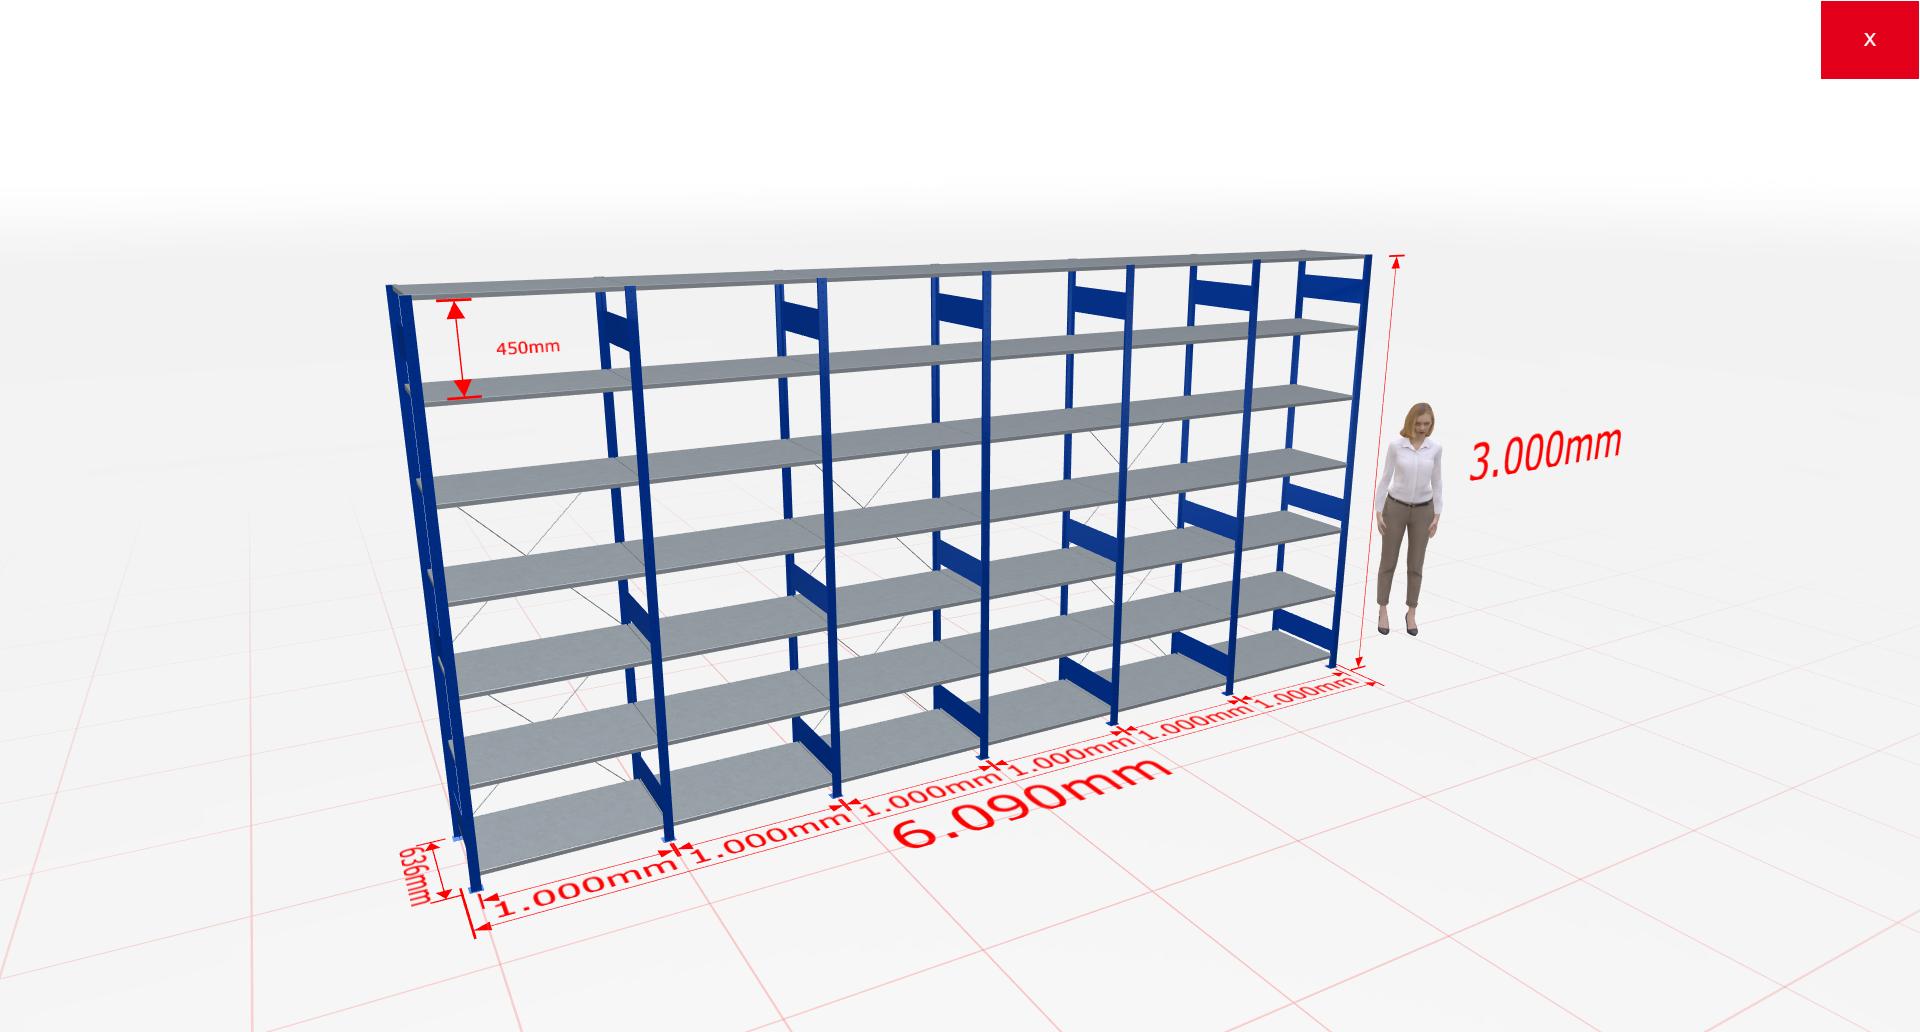 Fachbodenregal Komplettregal 3000x7096x600 mm (HxBxT) SCHULTE Lagertechnik blau 7 Ebenen  150 kg je Boden